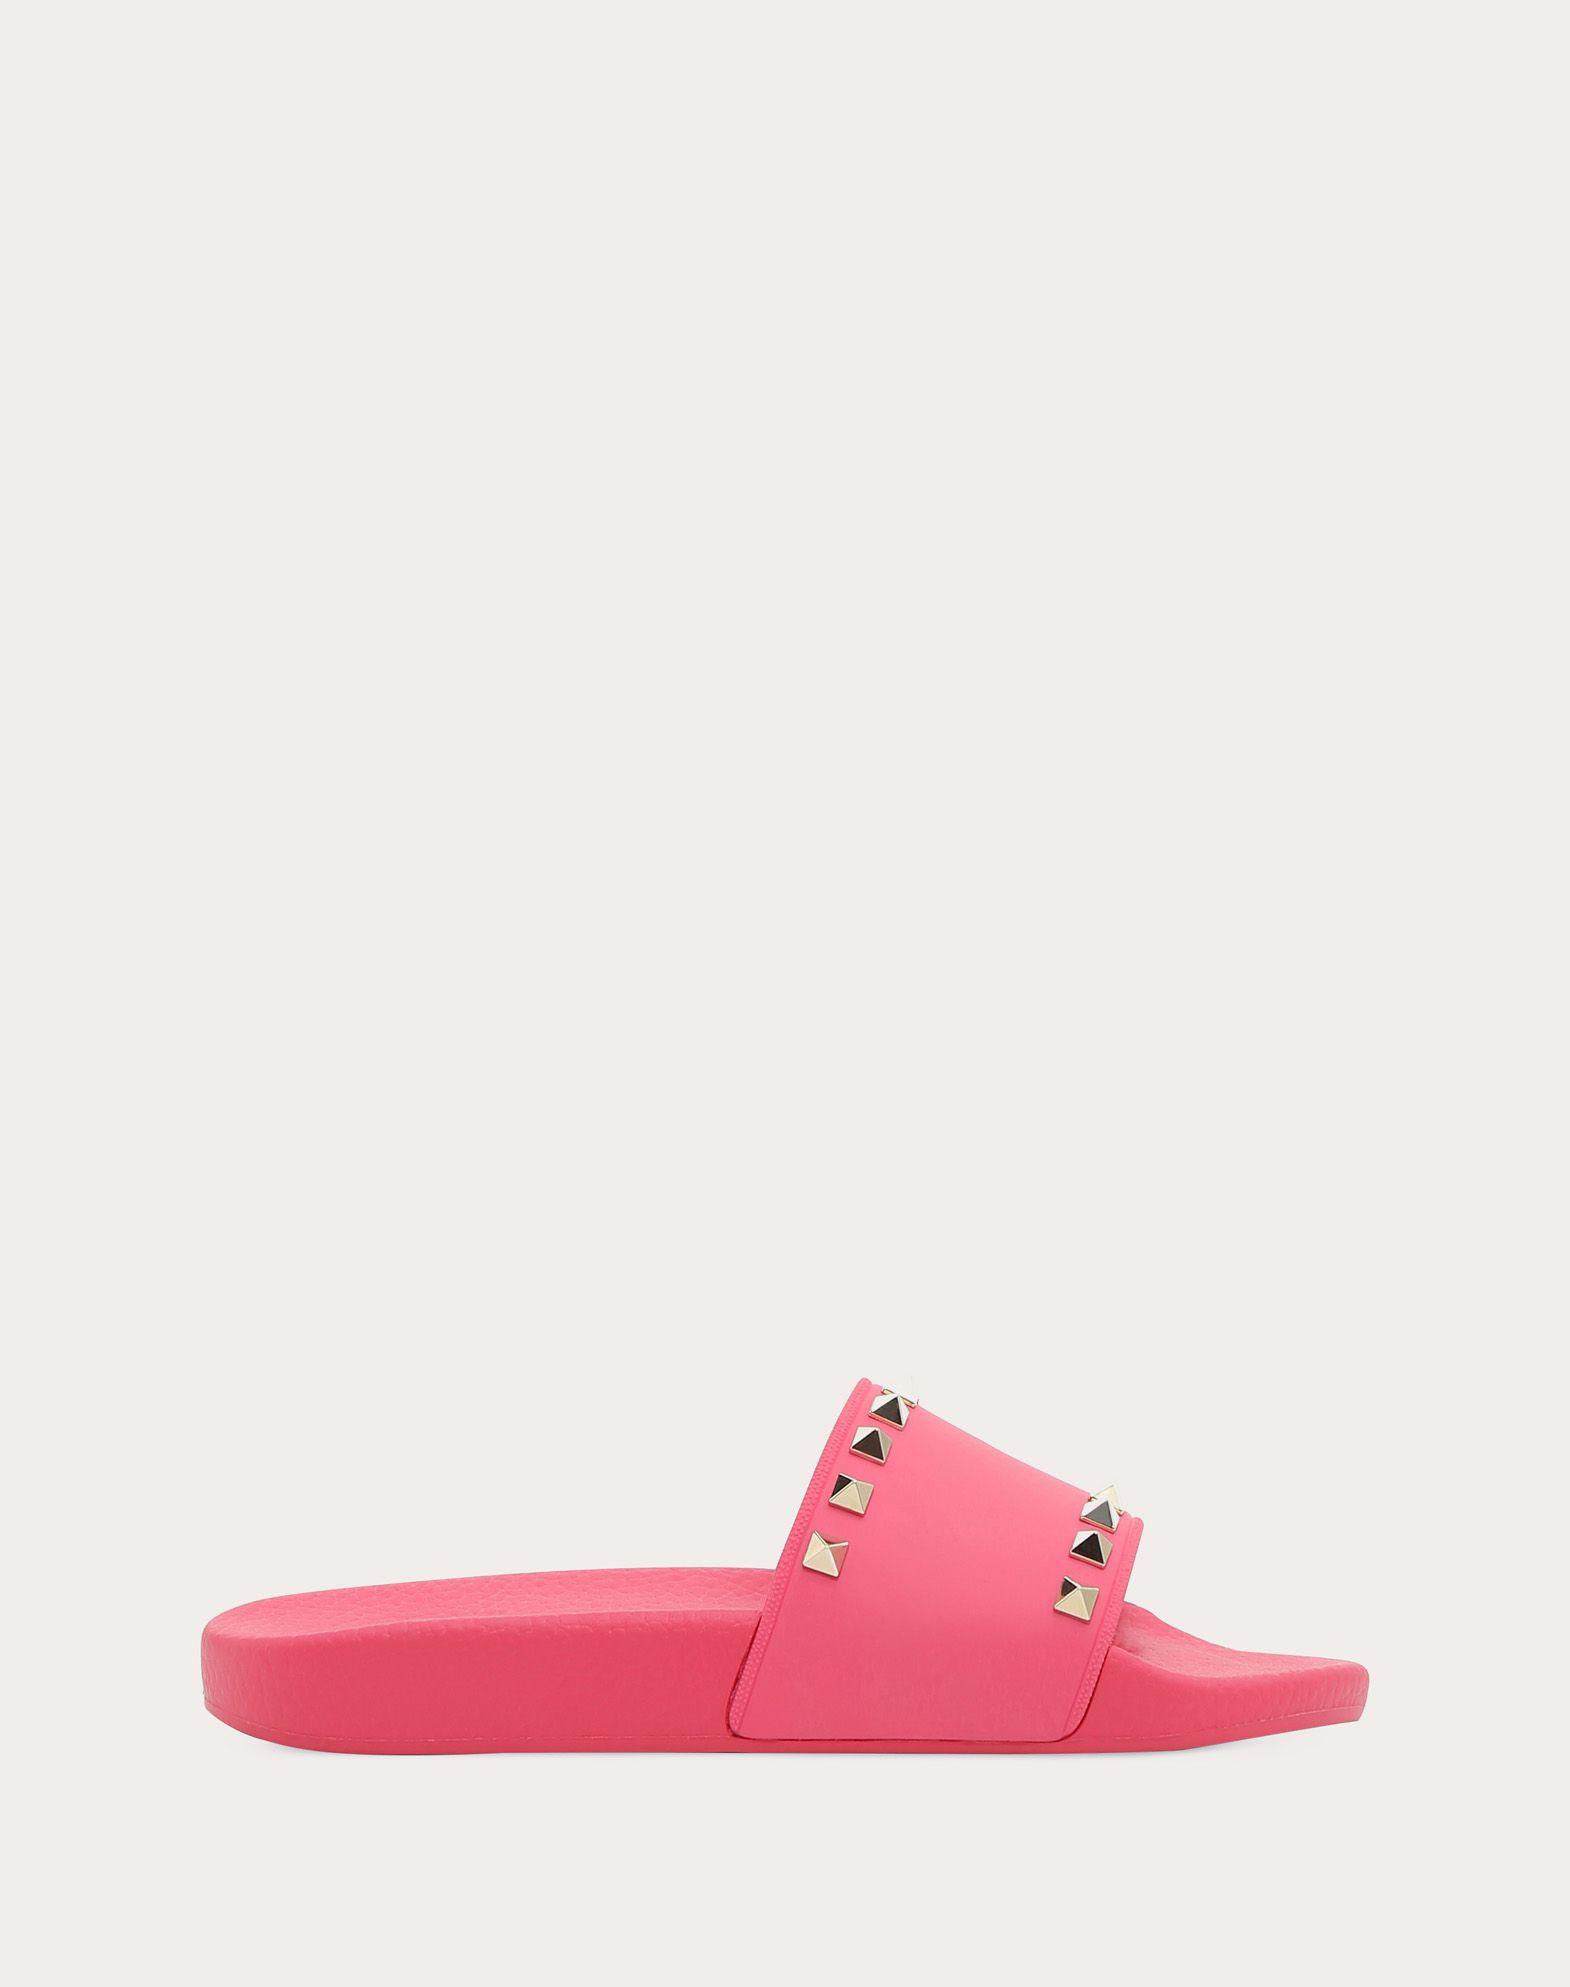 VALENTINO GARAVANI Rockstud PVC Slide Sandal SLIDE SANDAL D f